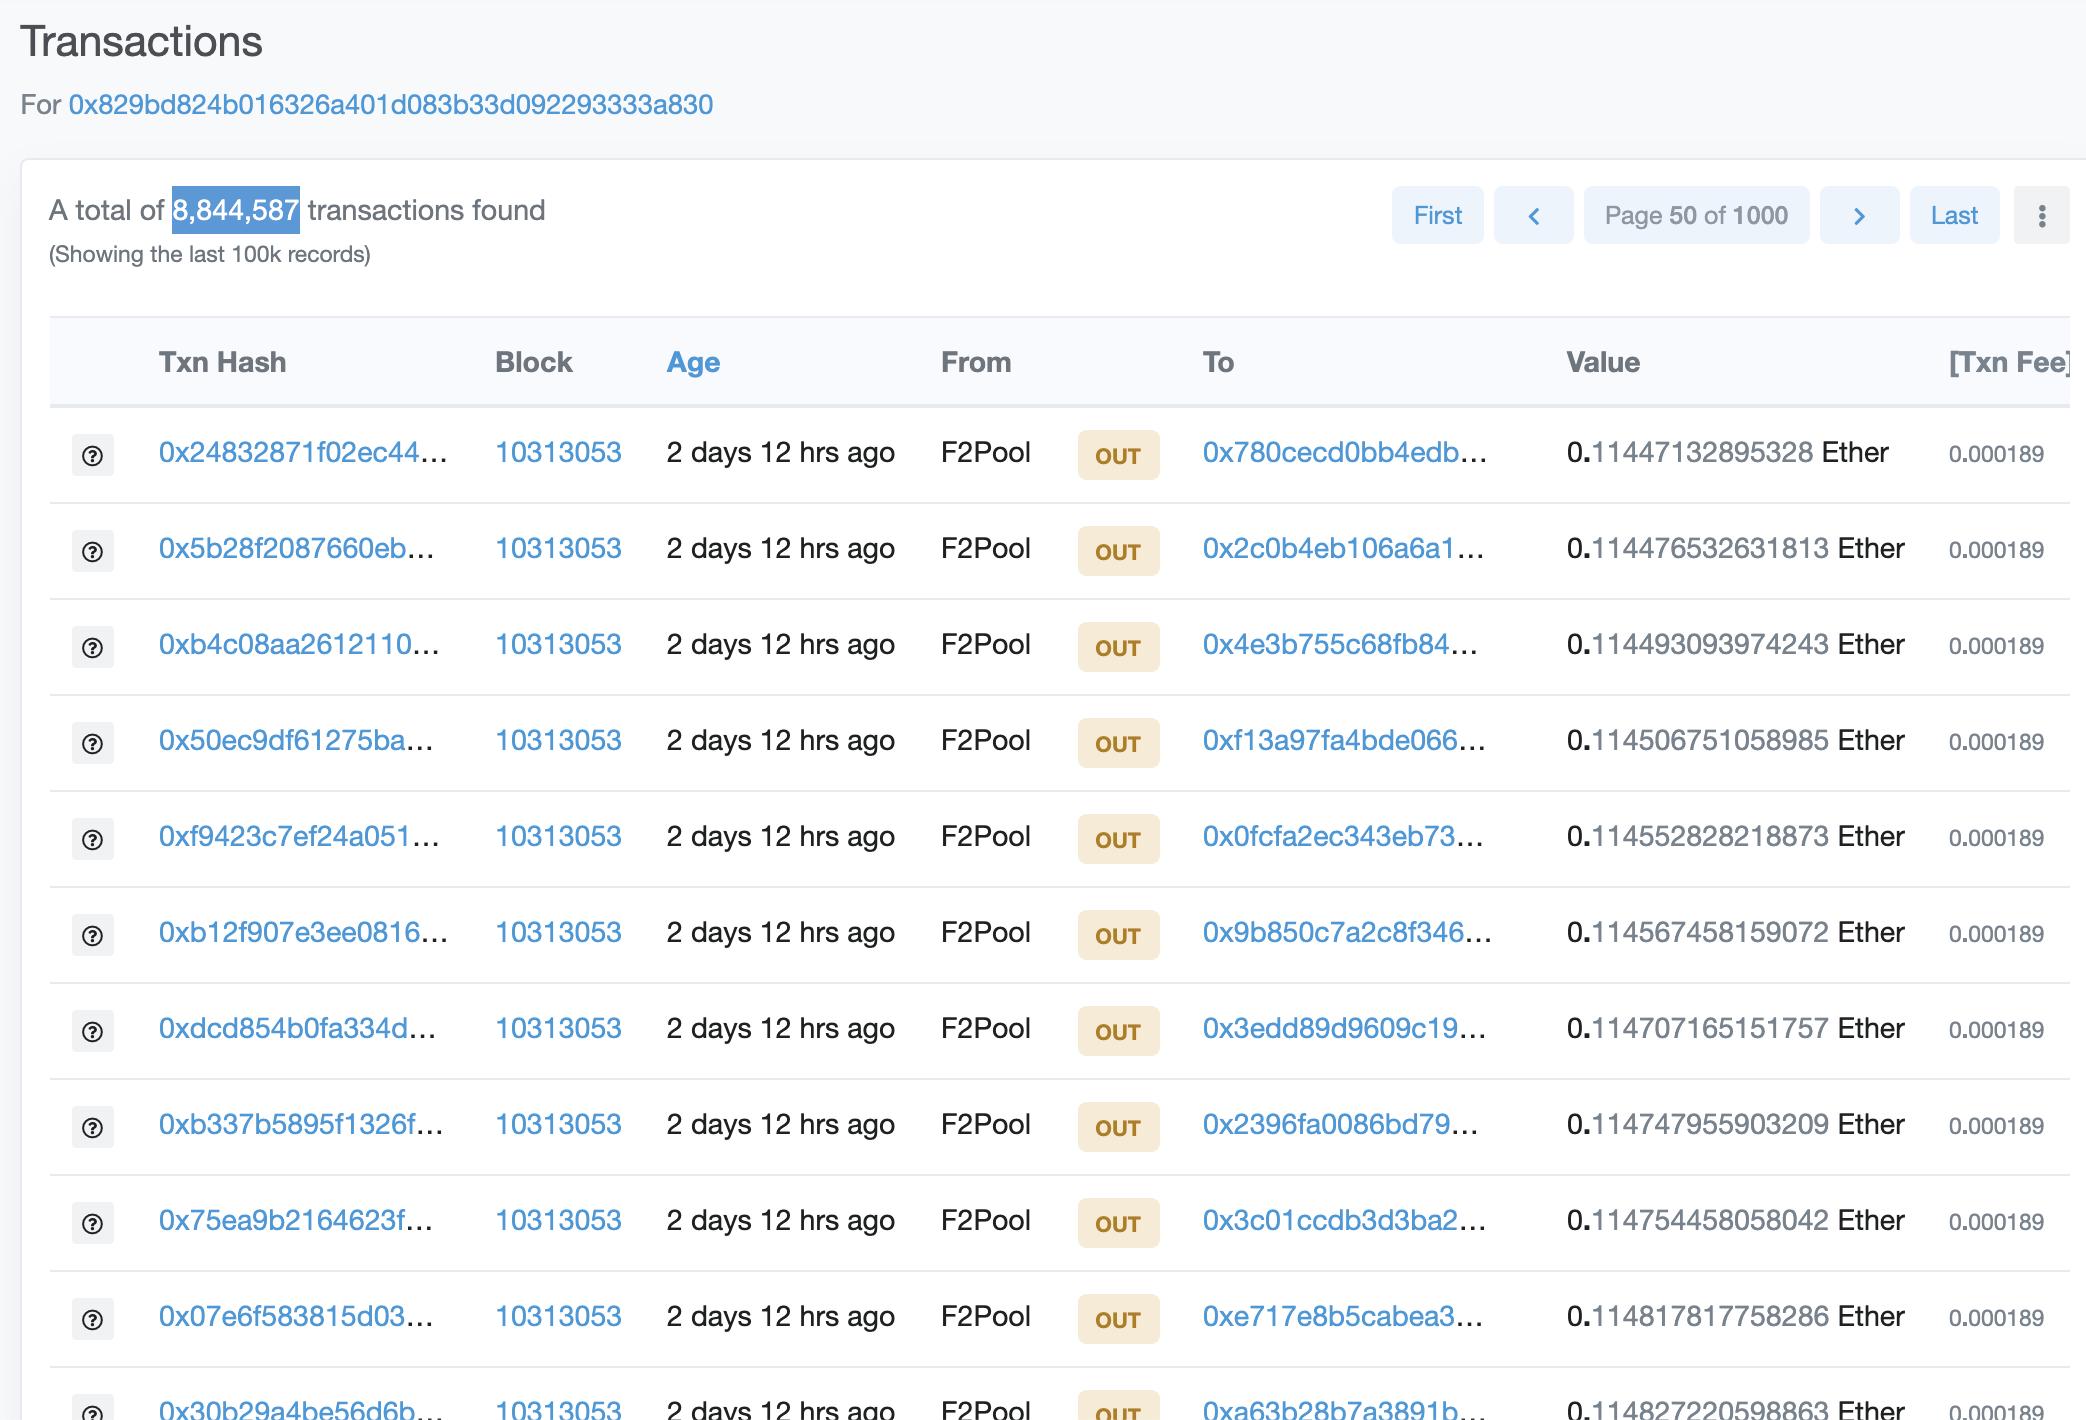 F2Pool spamming ethereum, June 2020